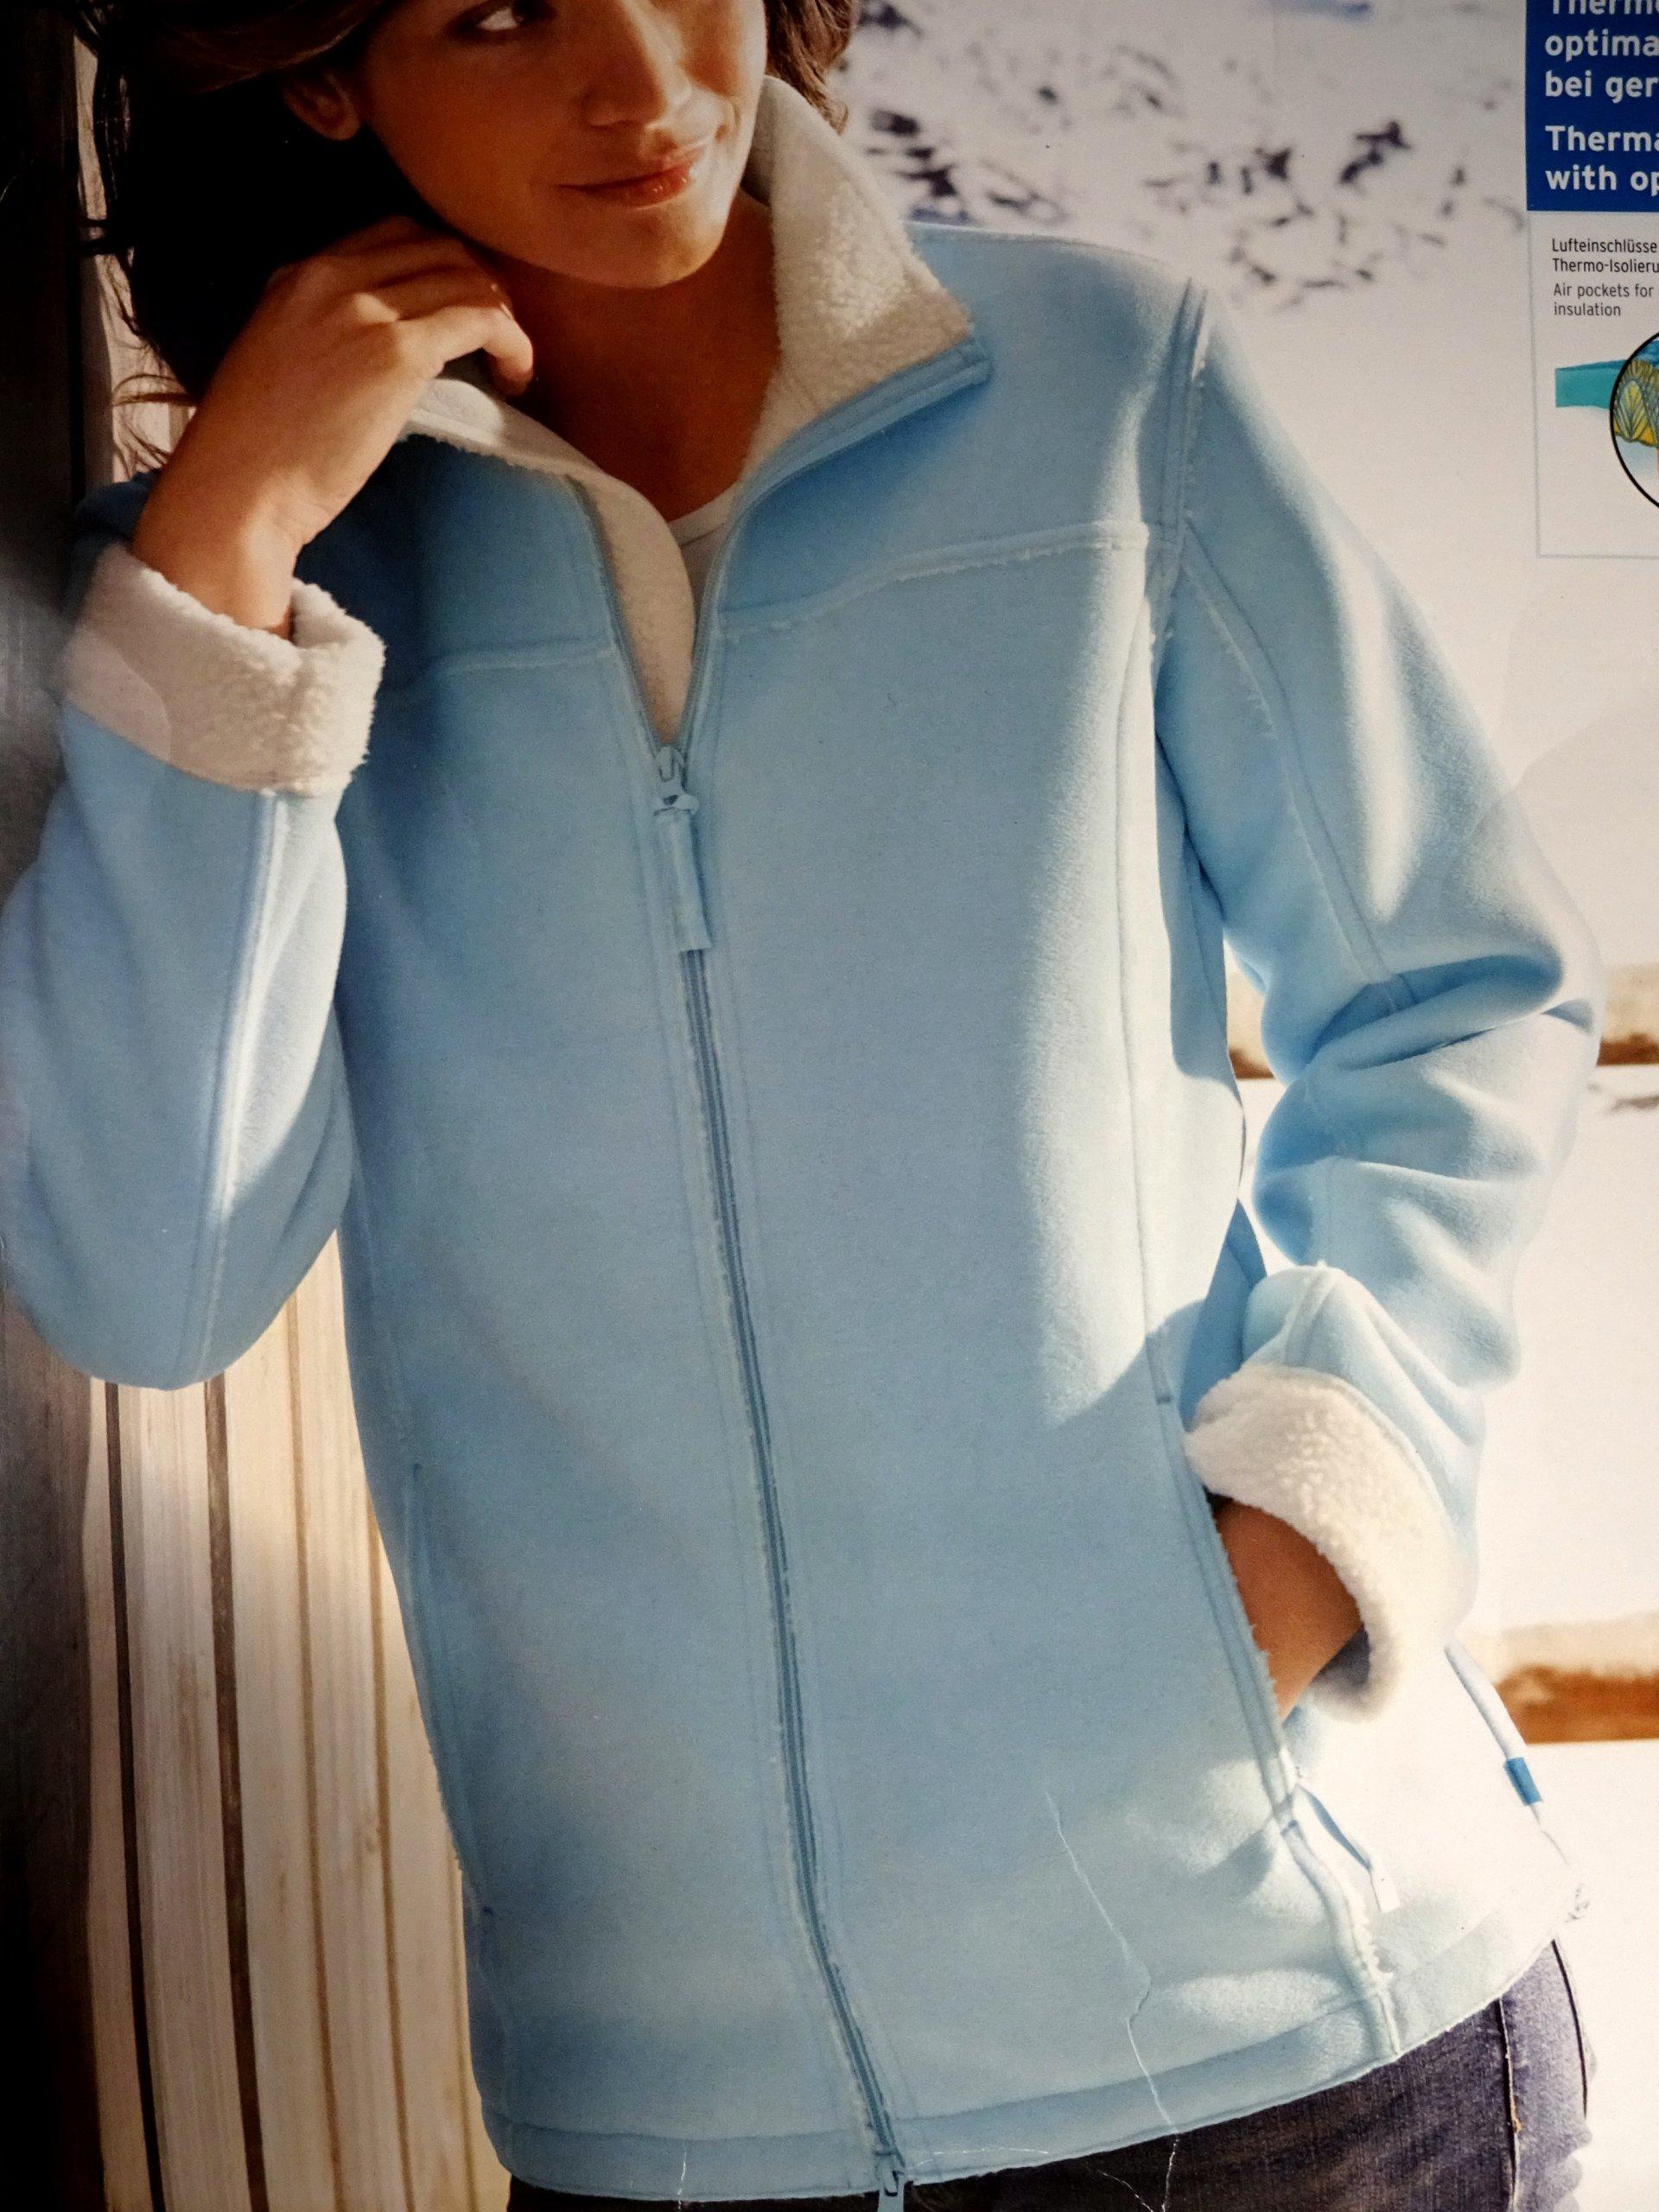 226b4aaf5d Sportowa bluza damska polar Tchibo rozm. 40 42 - 7240487218 ...